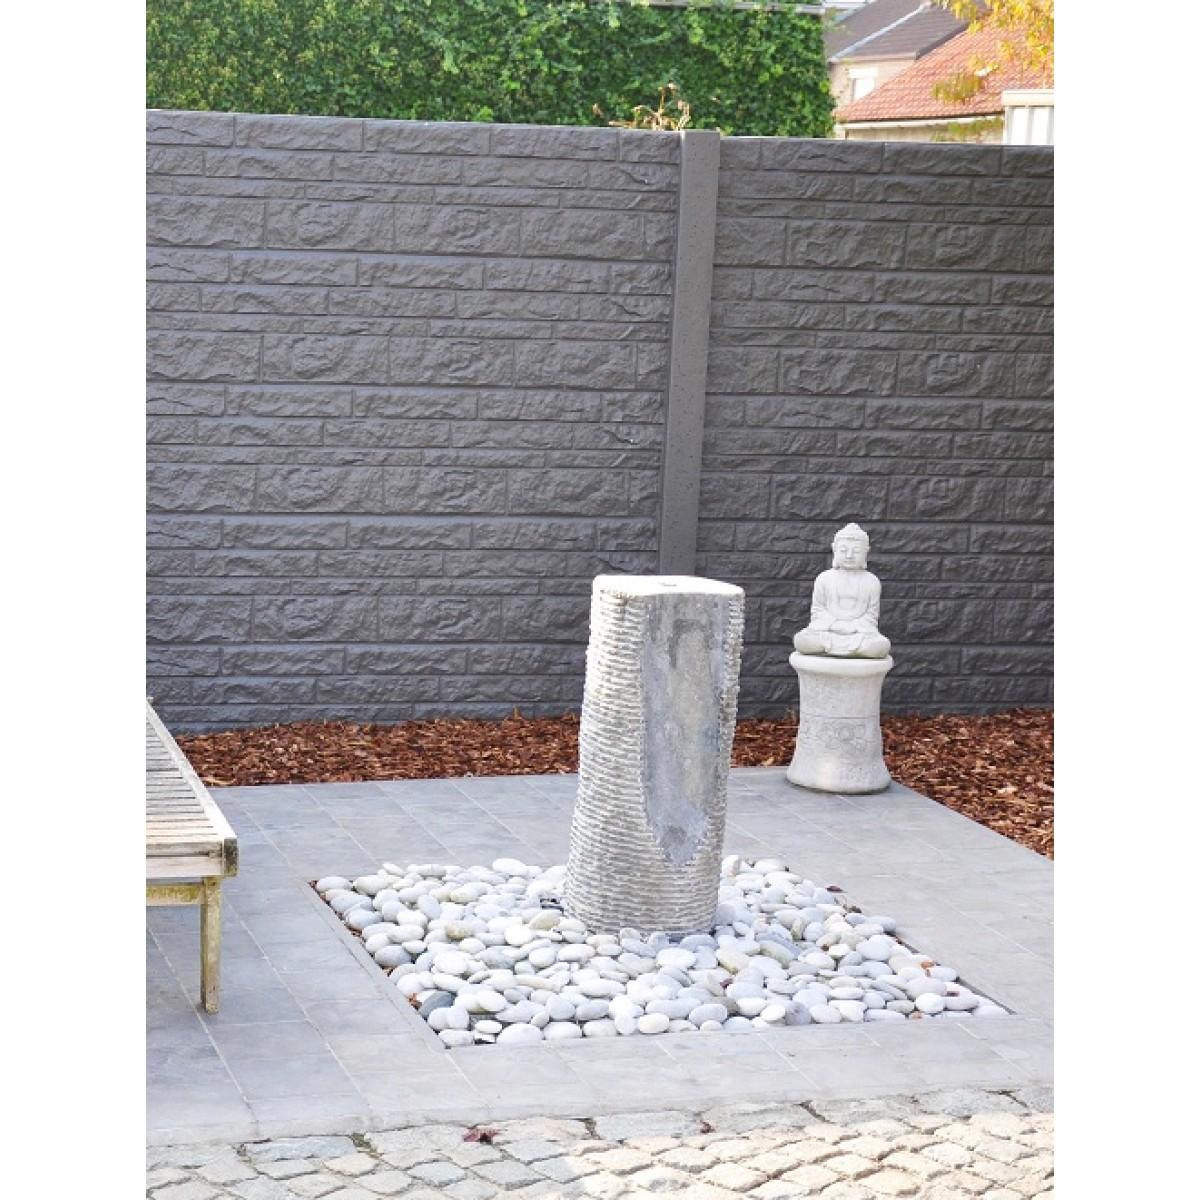 Alle beton schuttingen van Schutting33 >>